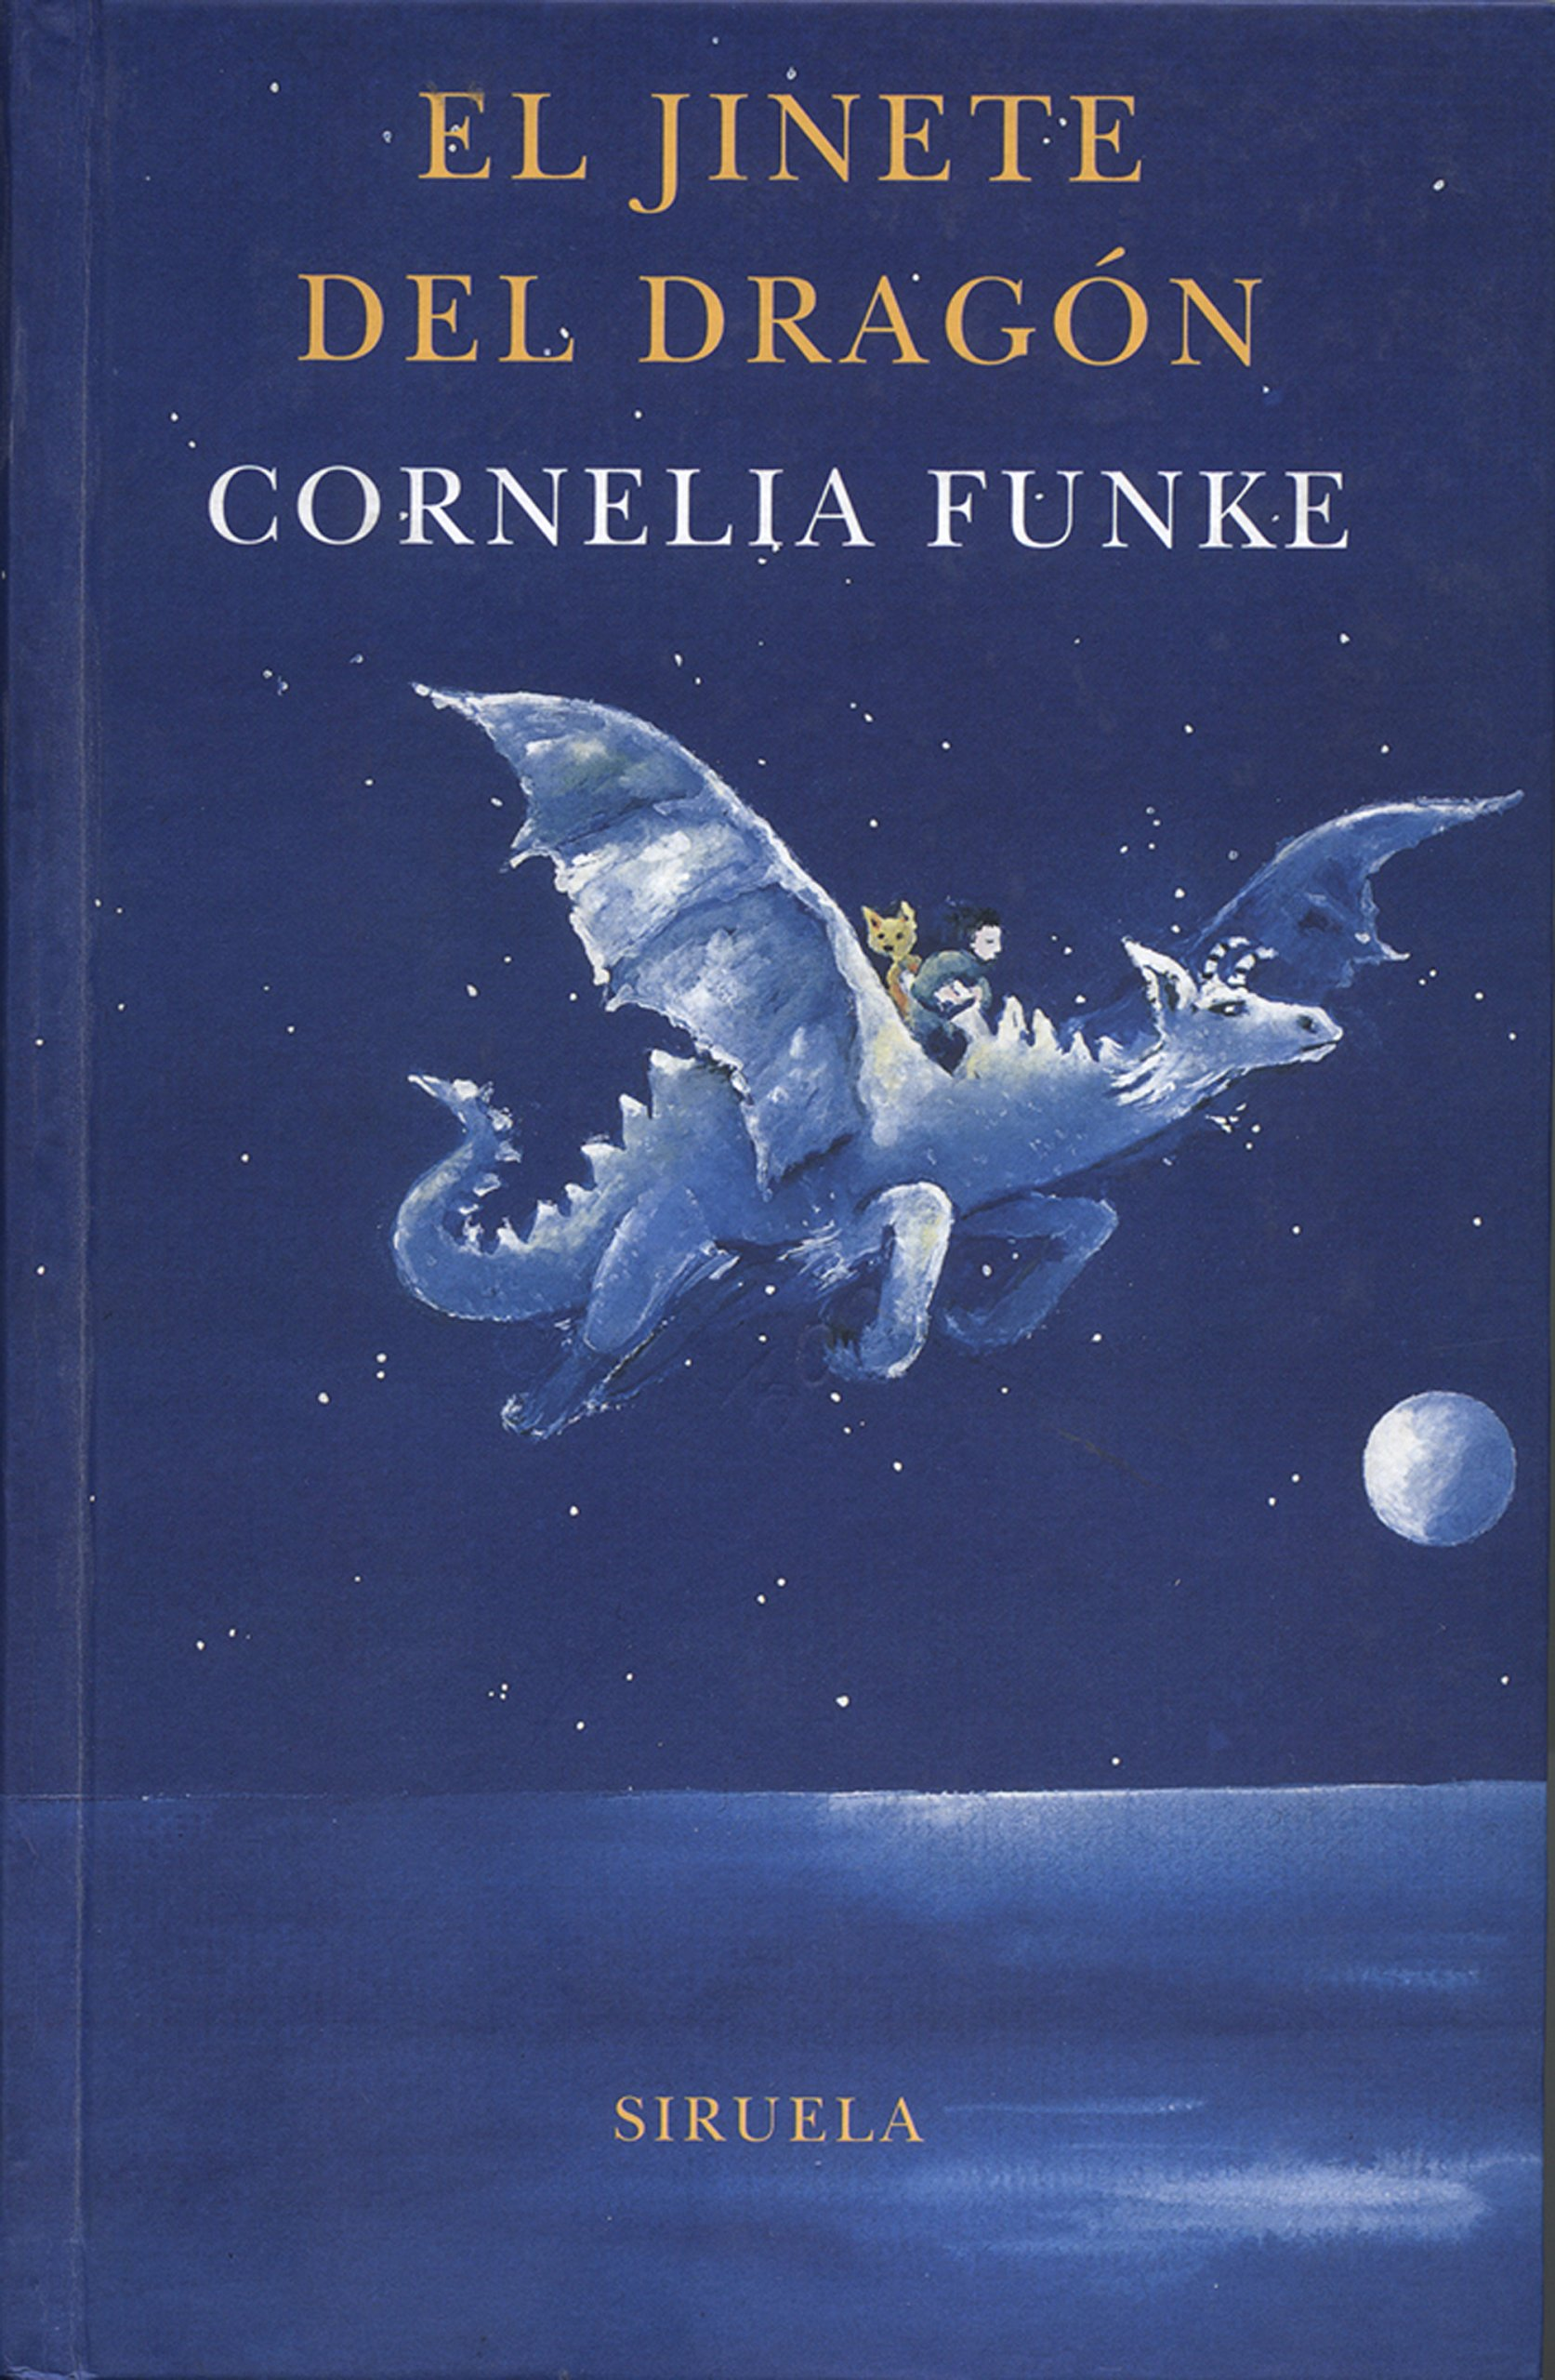 el jinete del dragon cornelia funke